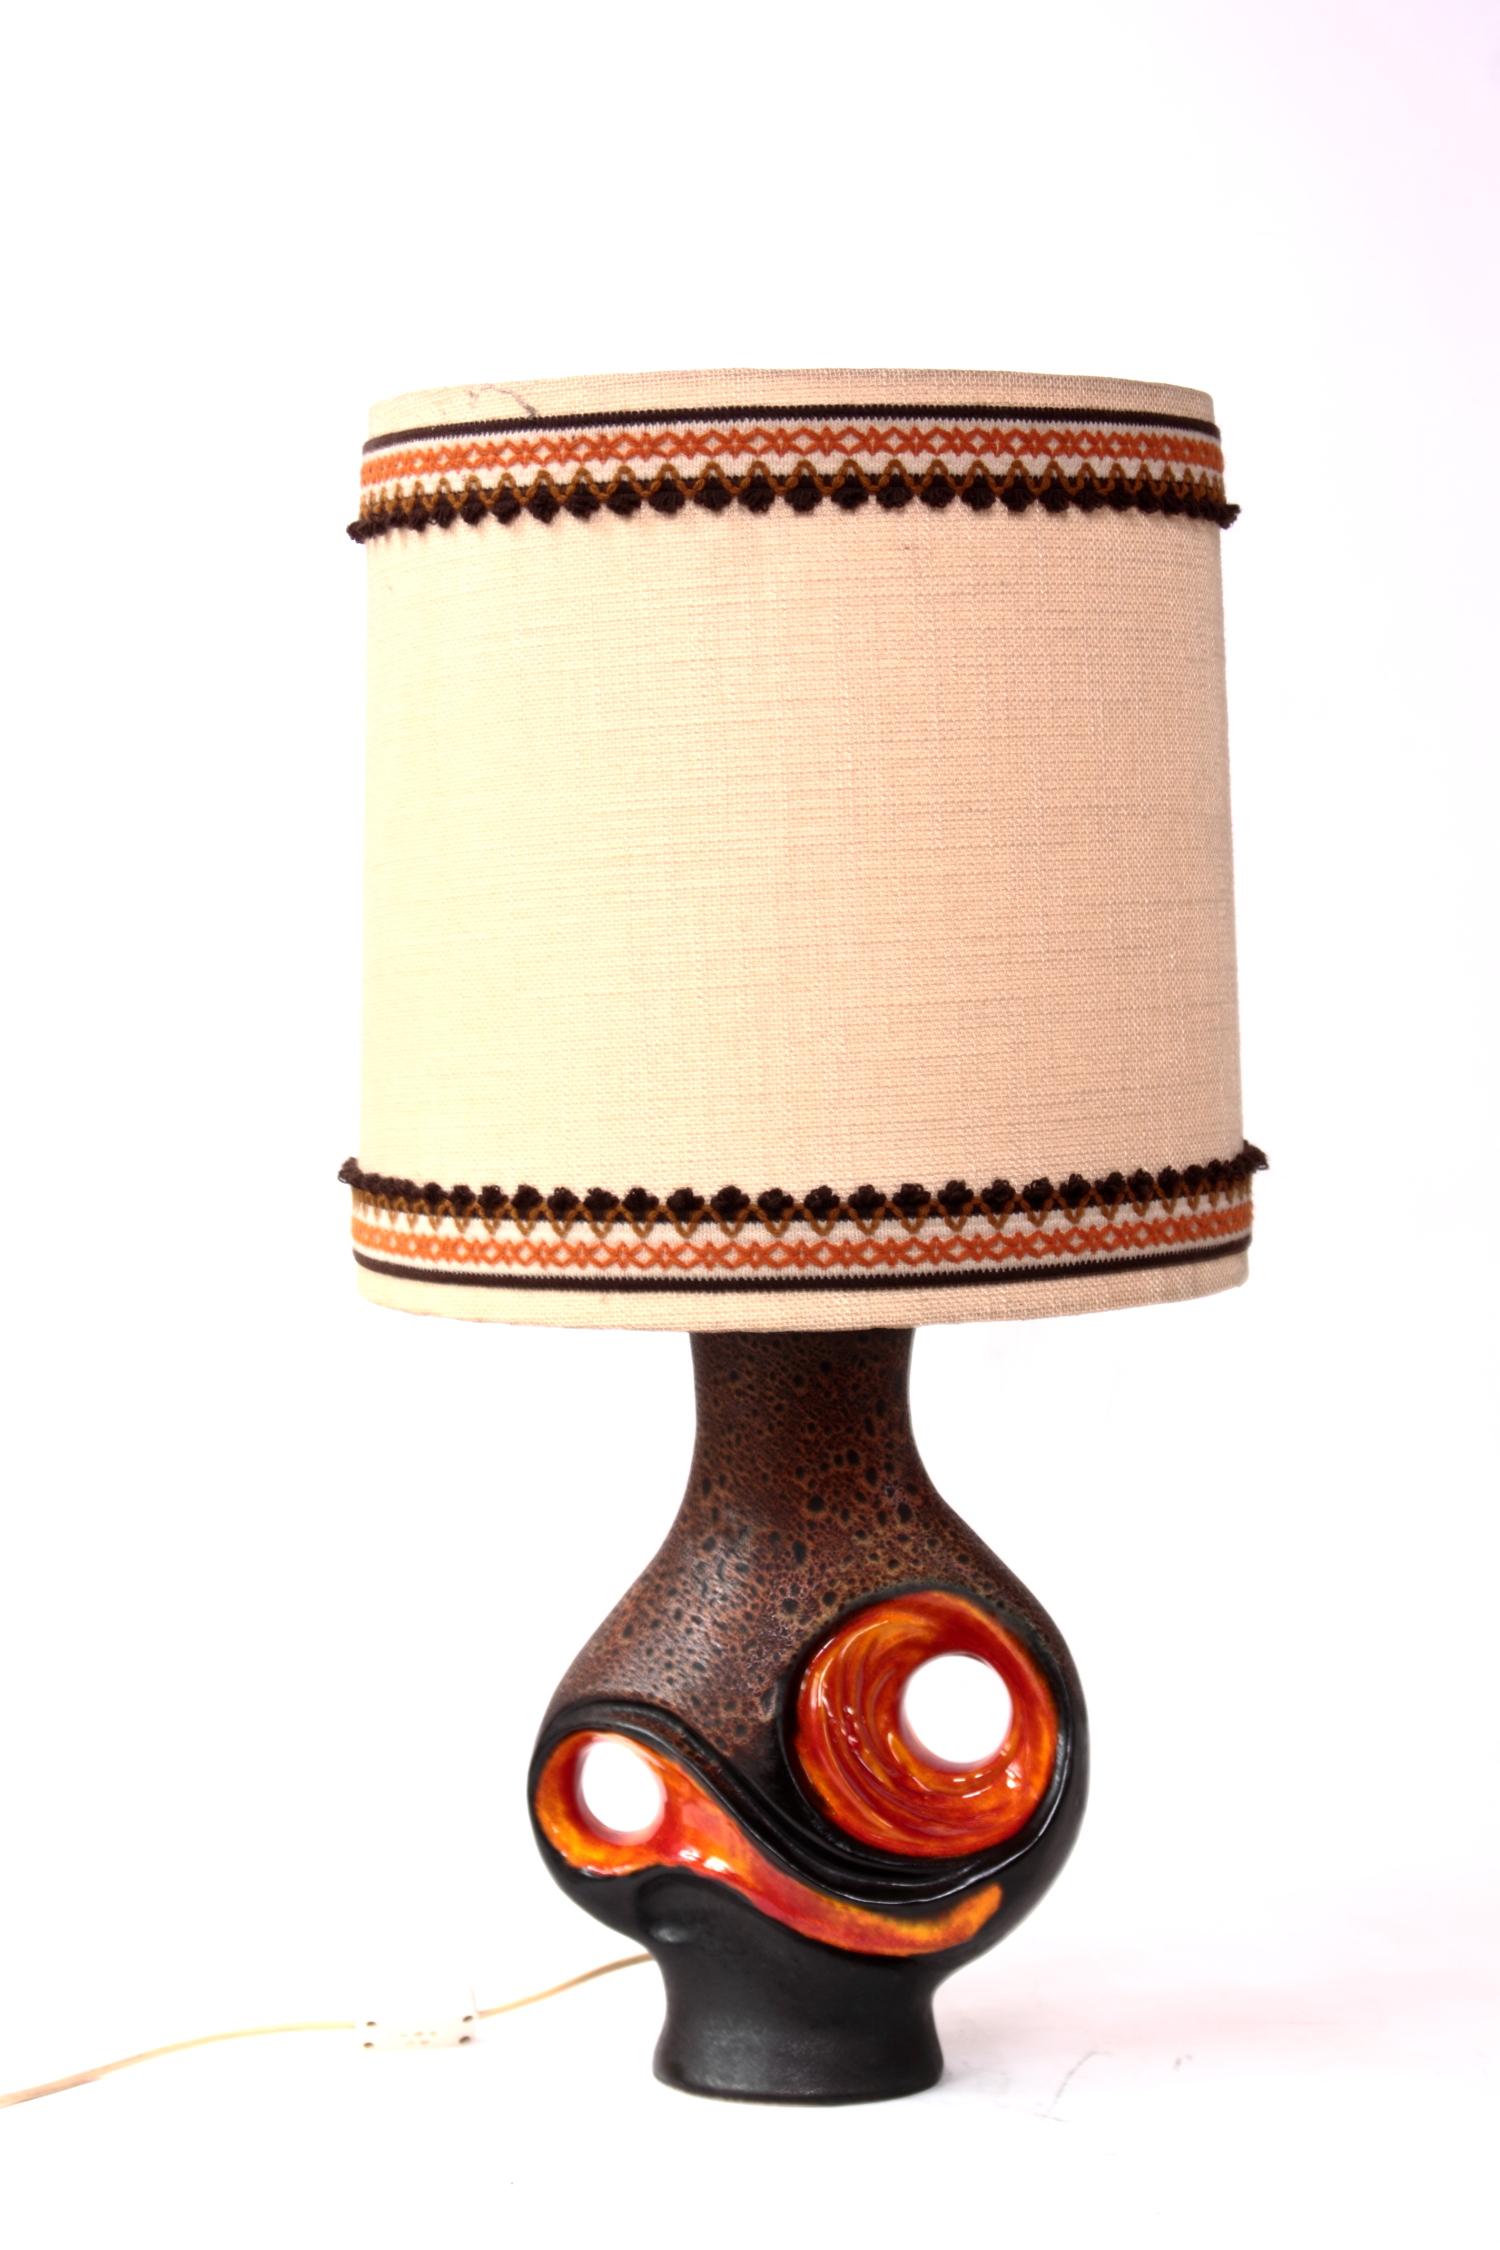 Stehlampe Tischlampe Lampe Vintage 70er Jahre Lampenfuss